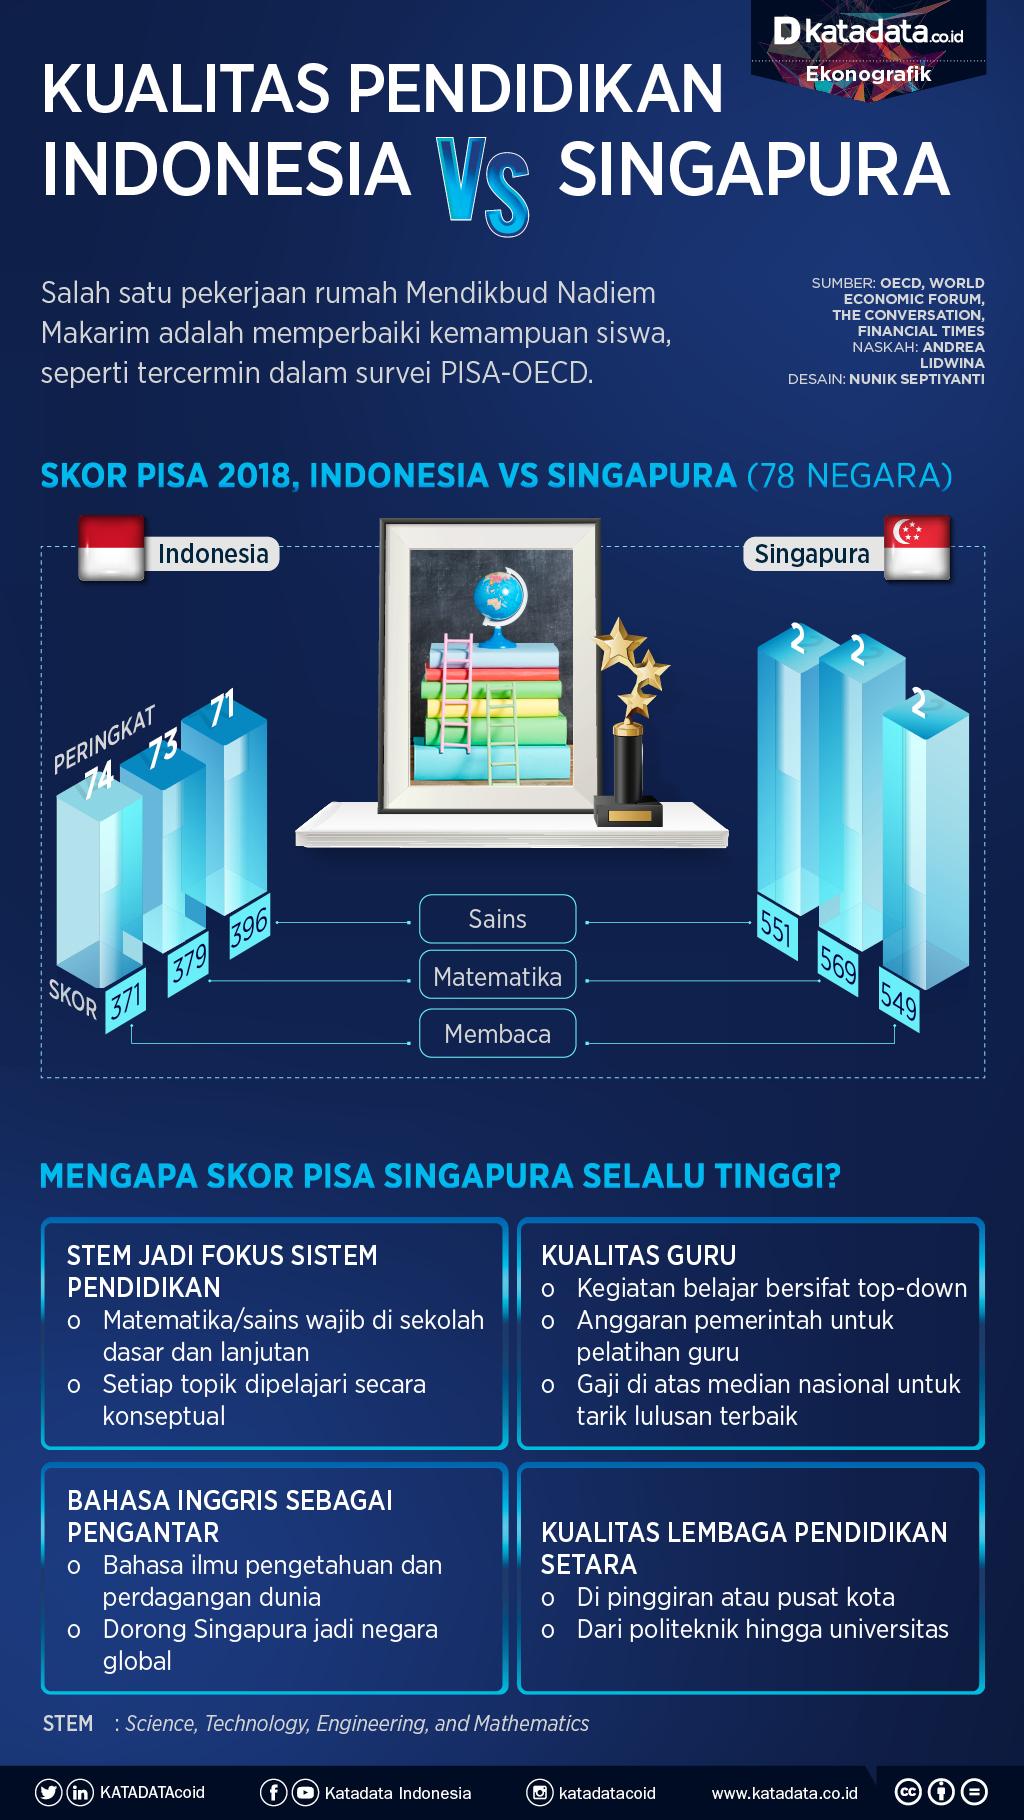 kualitas pendidikan indonesia-singapura